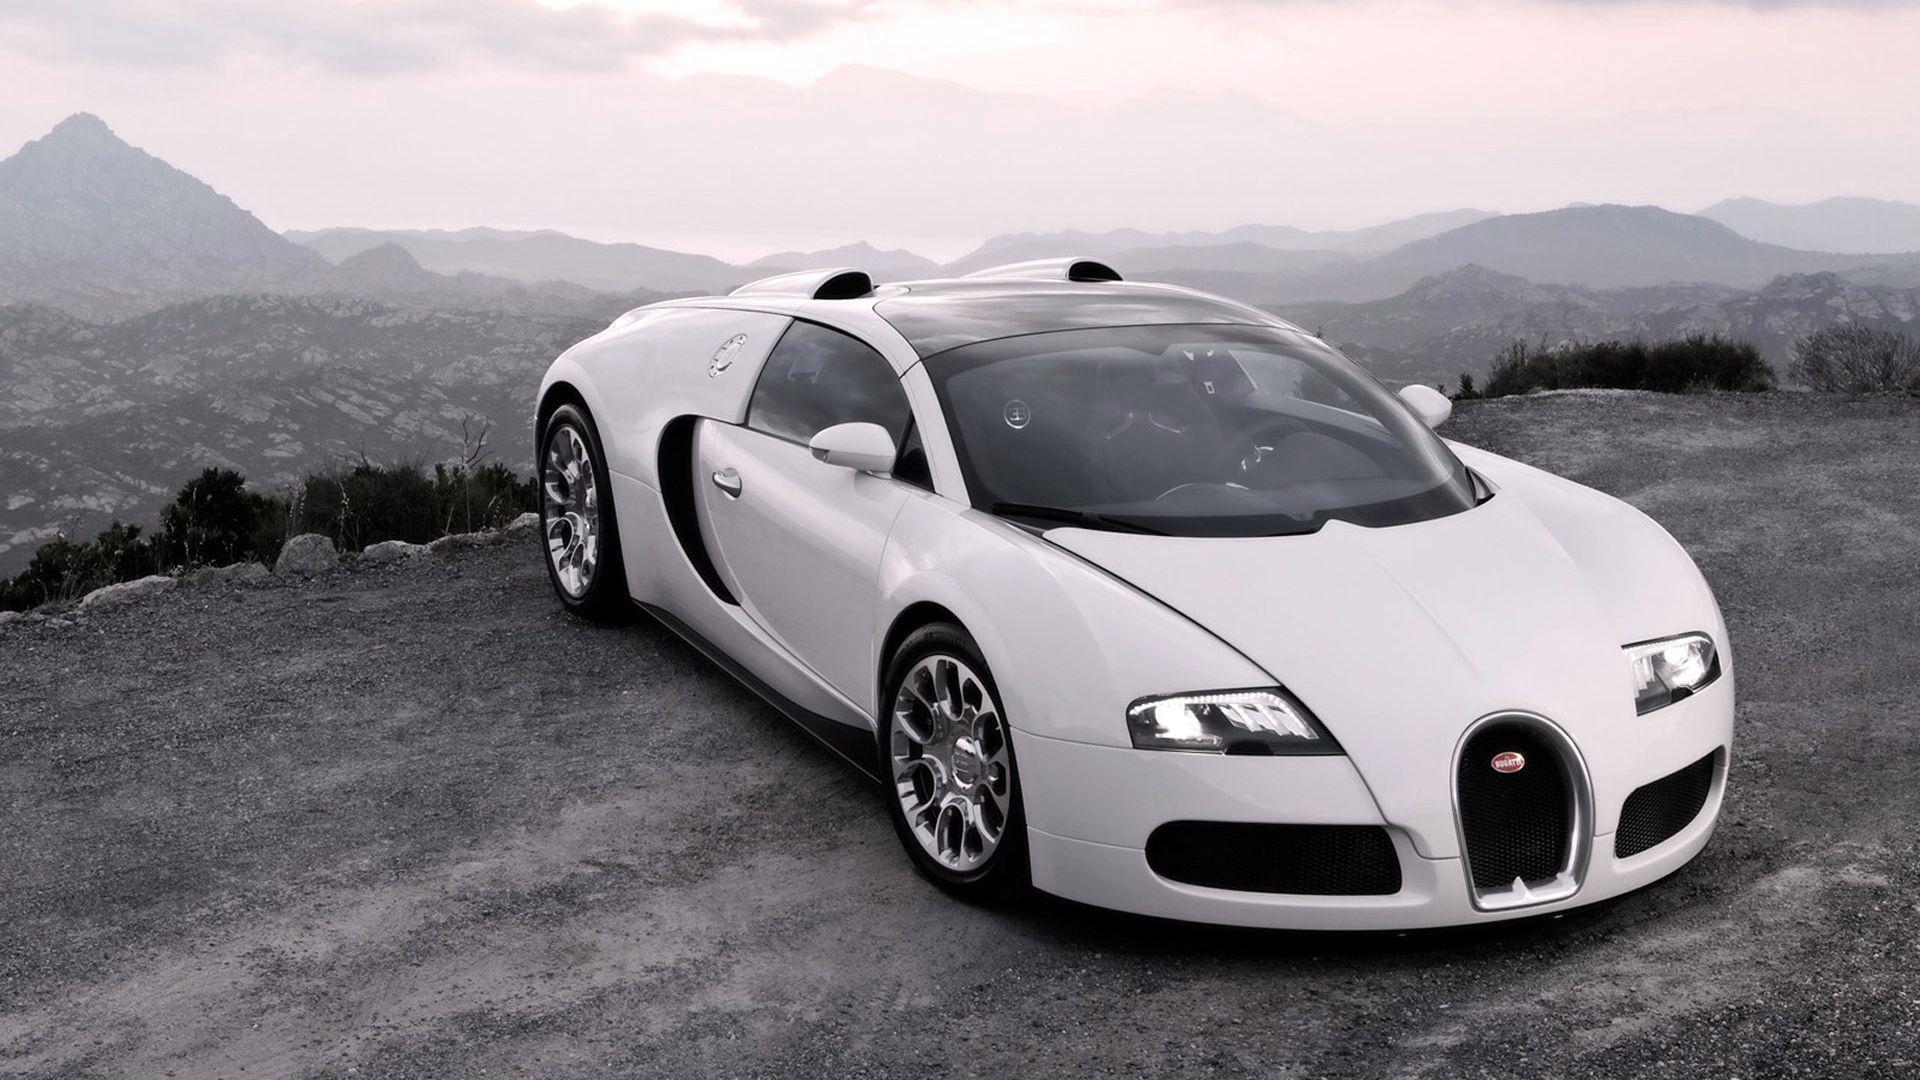 35c232cbc83fe9426d825c3ae2d849b6 Cozy Bugatti Veyron Rembrandt Edition Price Cars Trend